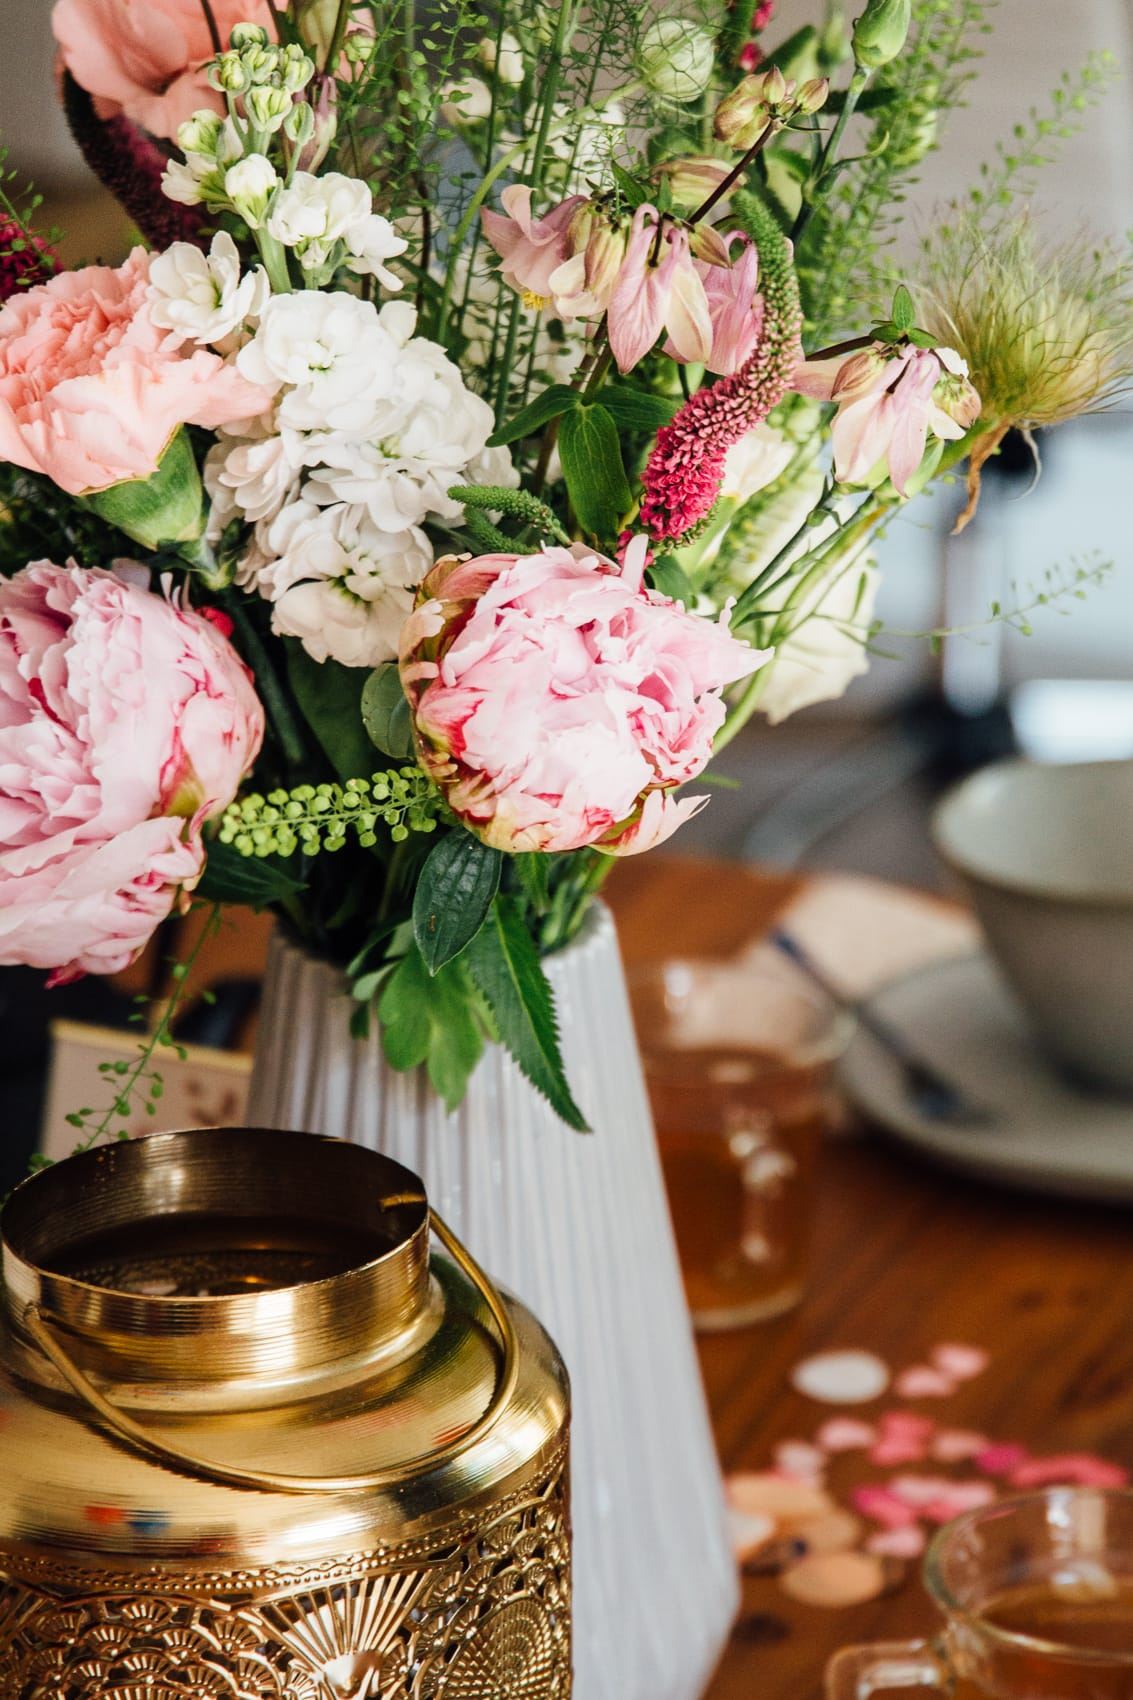 Richte die perfekte Tea Party aus - Royal Wedding 2018